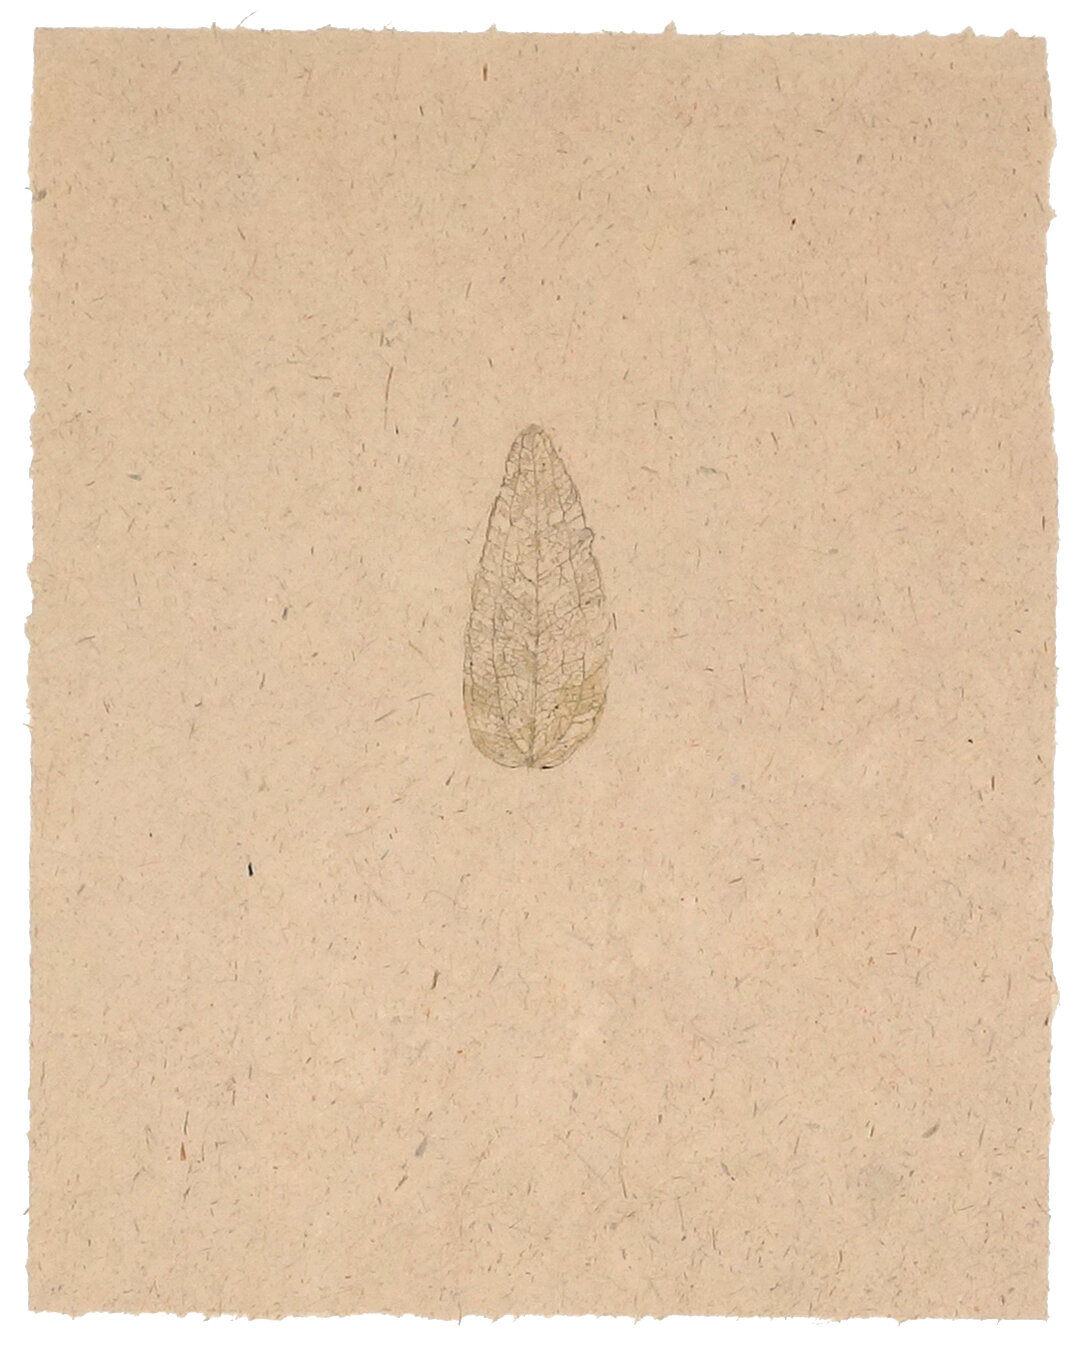 skeleton leaf 2.jpg